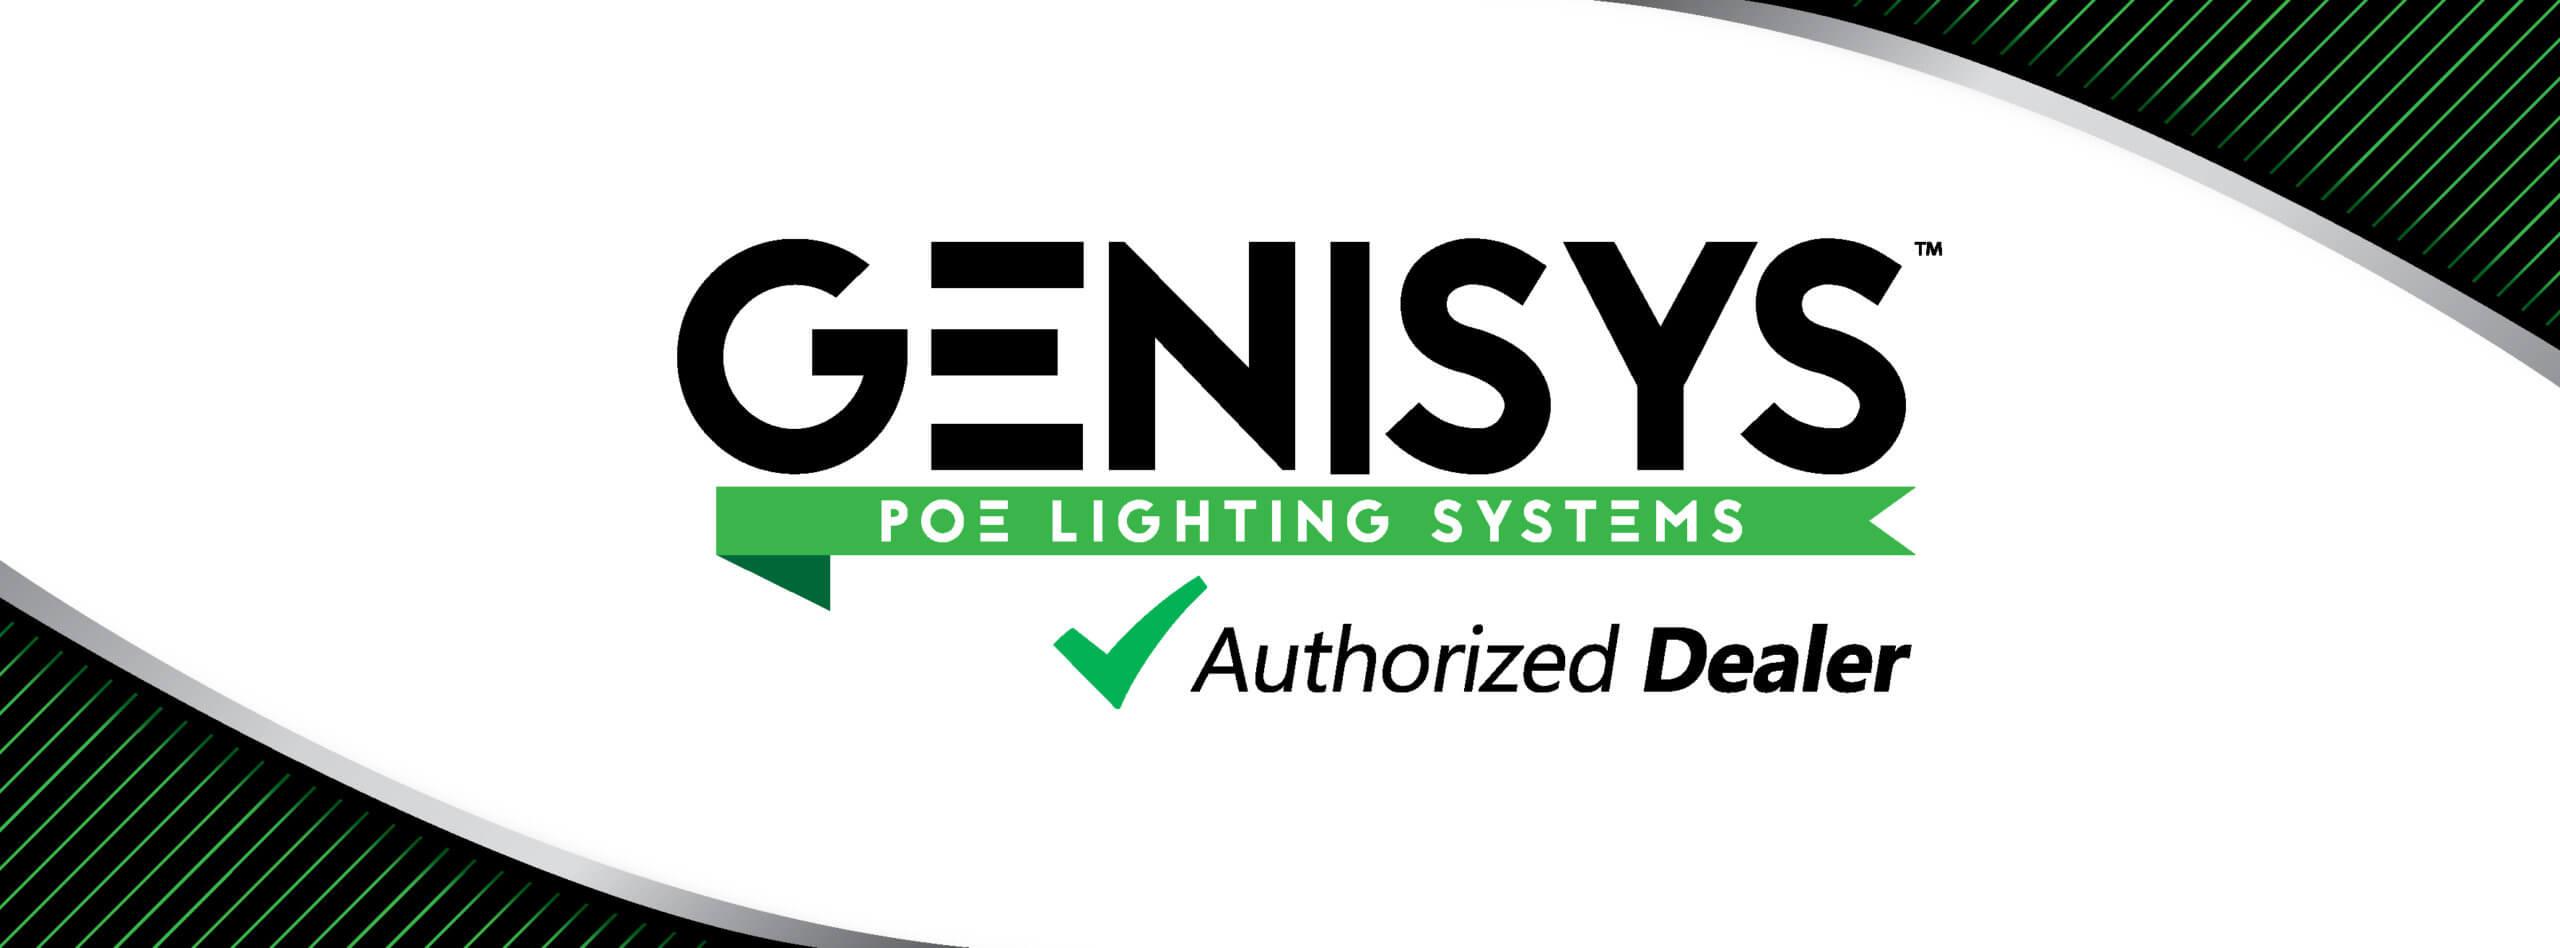 Genisys Authorized Dealer